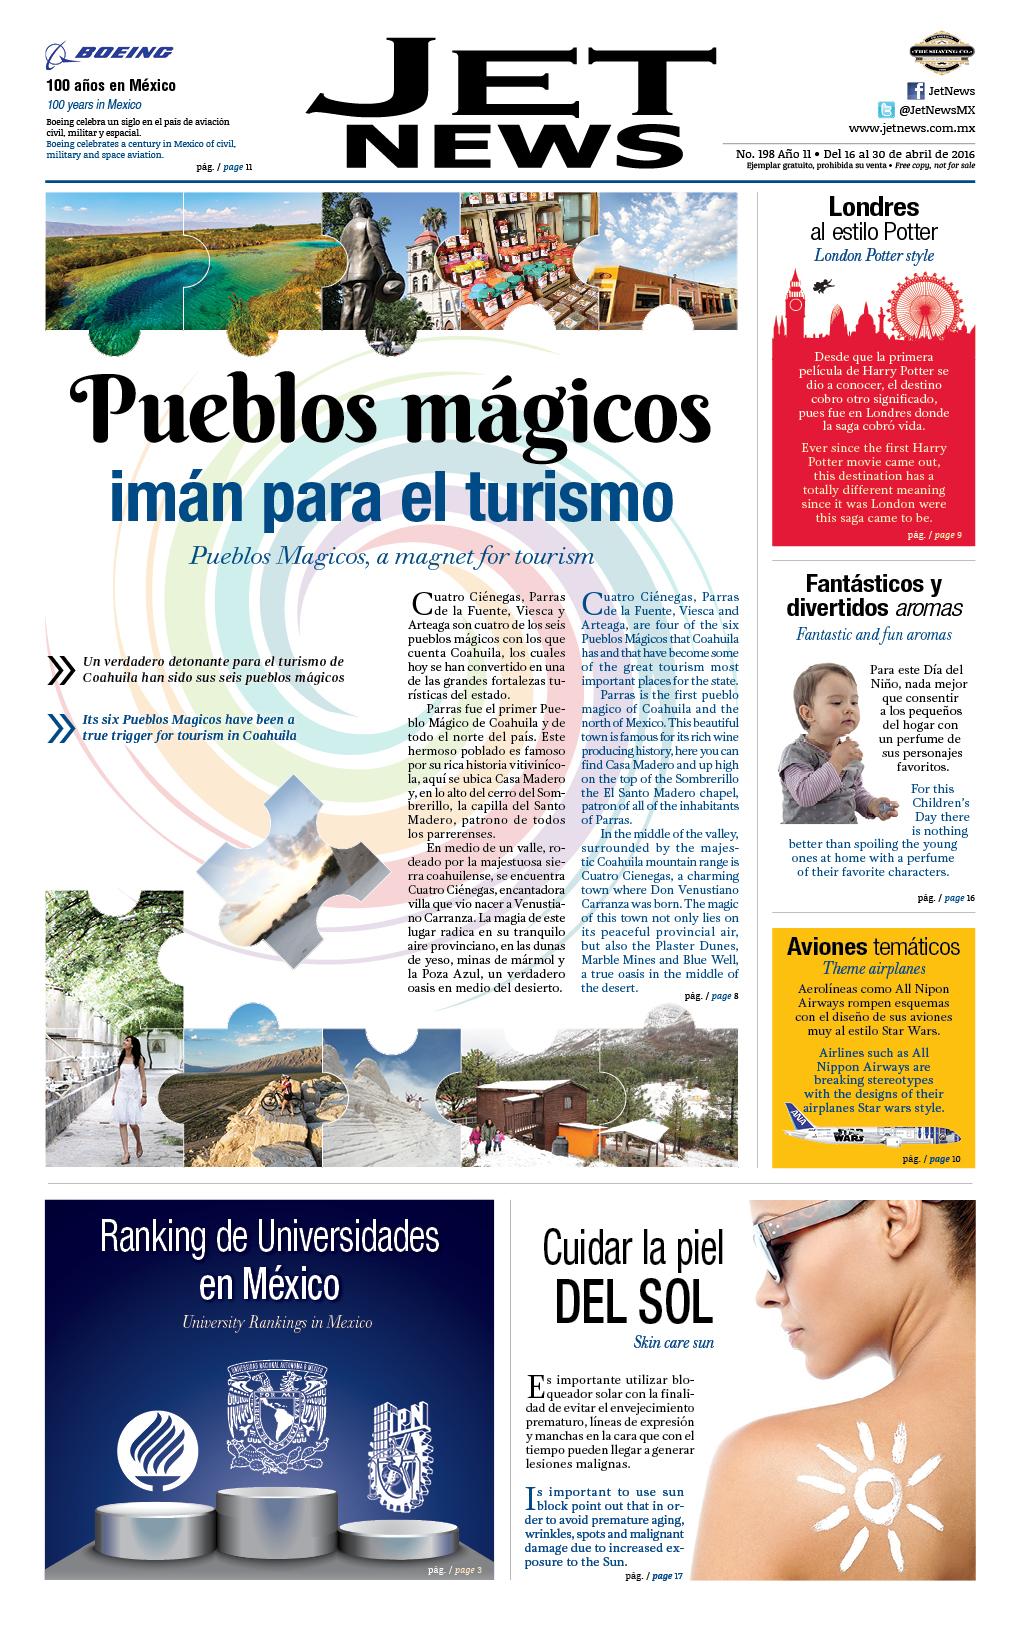 http://jetnews.com.mx/wp-content/uploads/2016/04/jet-news-198-pueblos-magicos.jpg